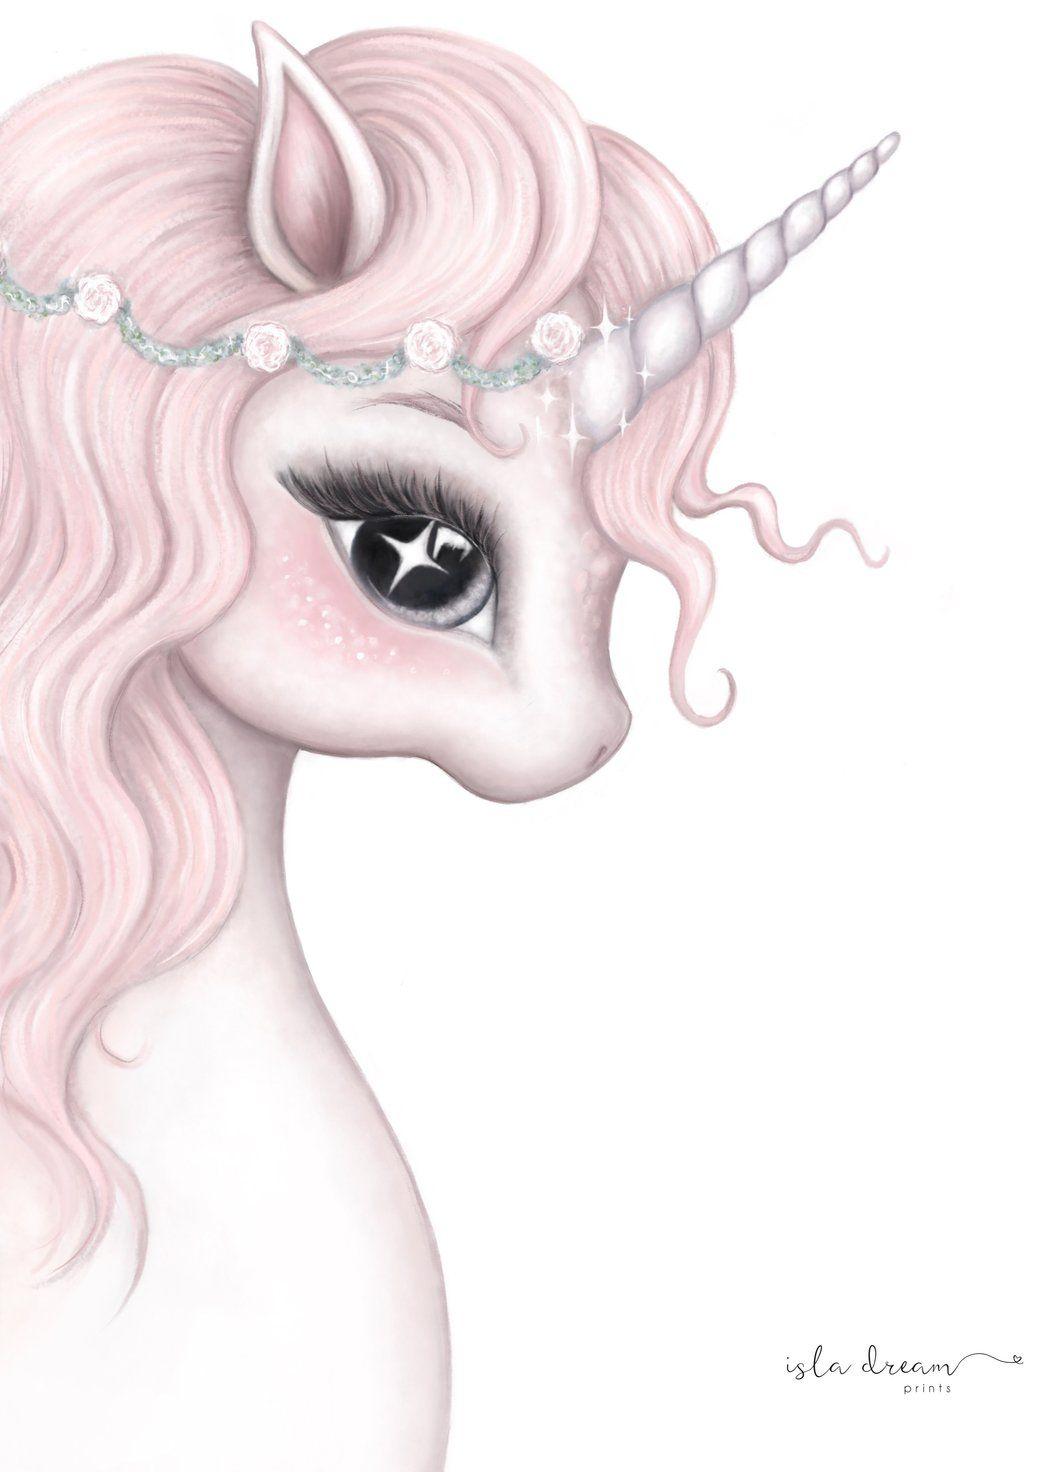 Rosa Unicorn Print Isla Dream Prints Unicorn Wallpaper Cute Unicorn Artwork Unicorn Painting